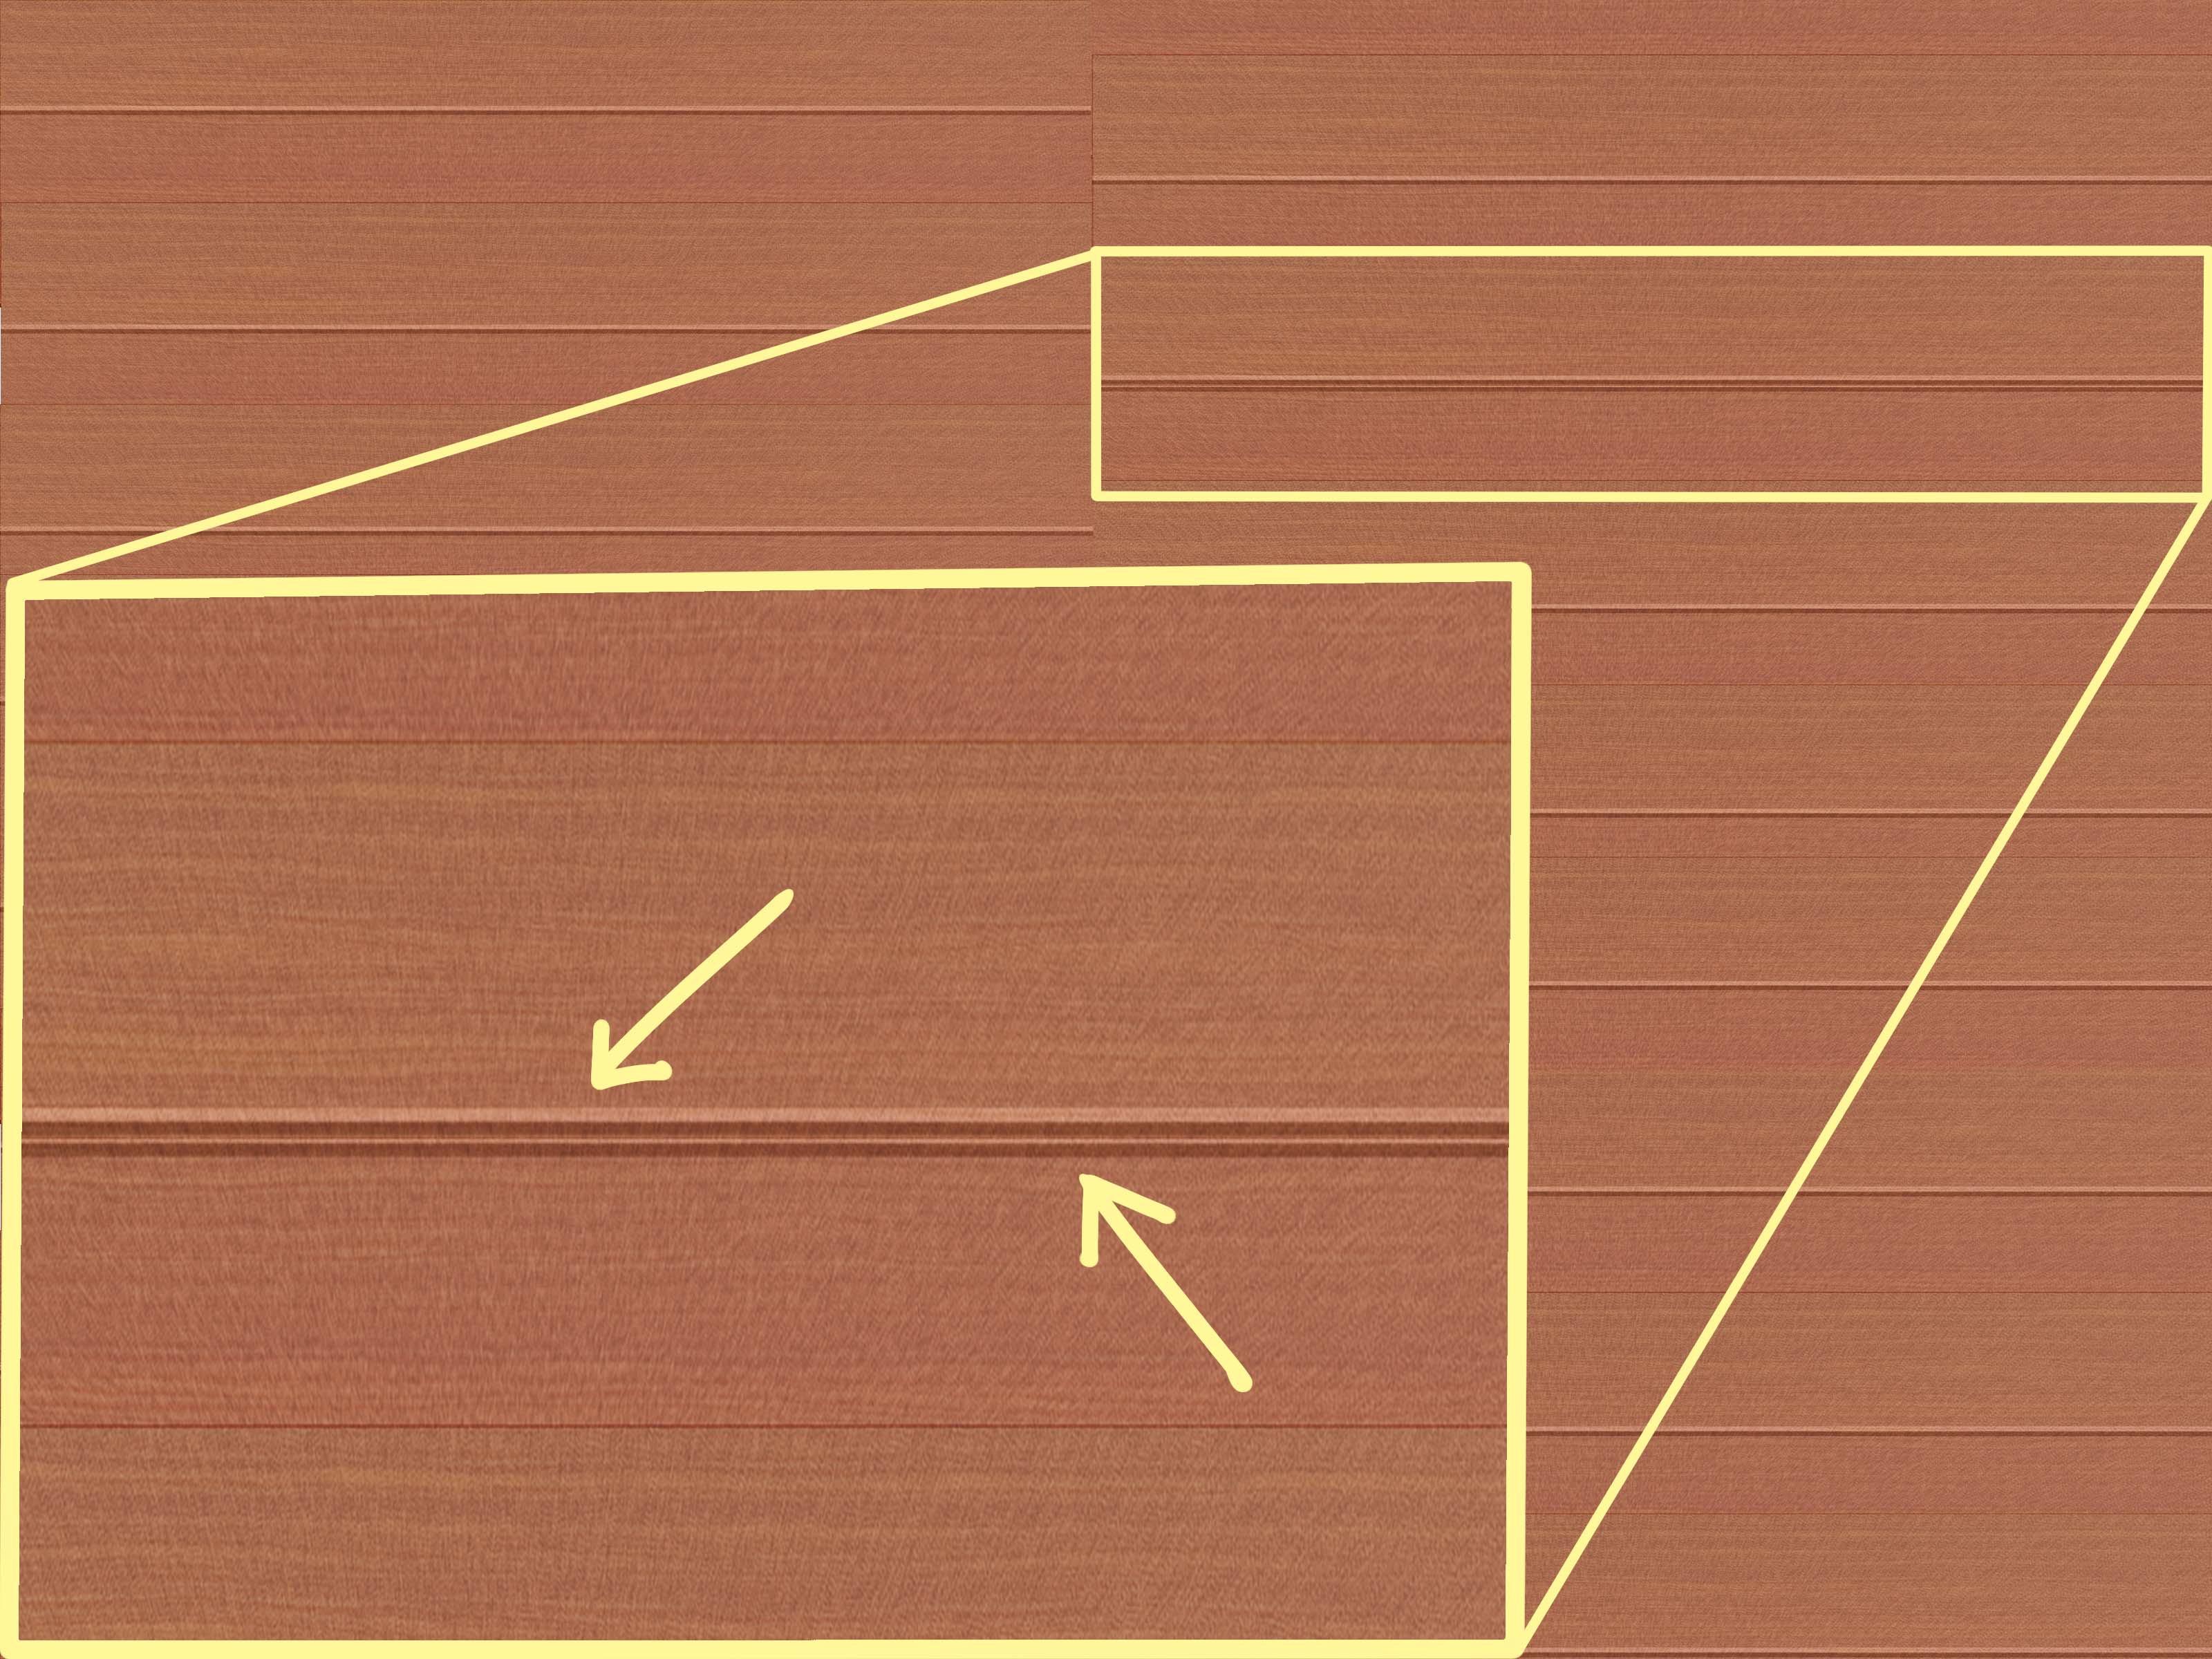 original hardwood floors under carpet of how to avoid common problems when installing laminate flooring in avoid common problems when installing laminate flooring step 9 version 2